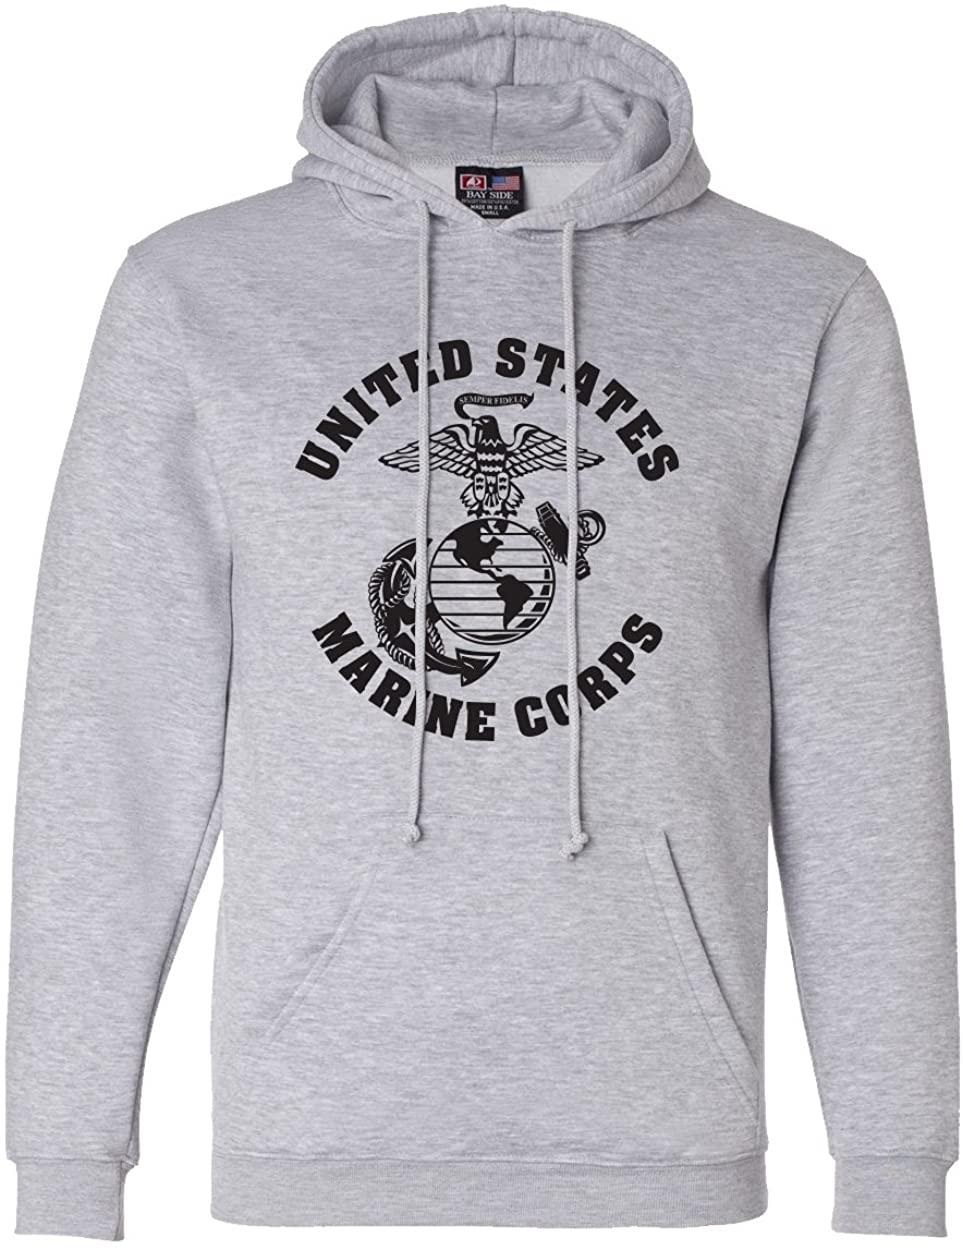 Large Marine Corps Design Hooded Sweatshirt